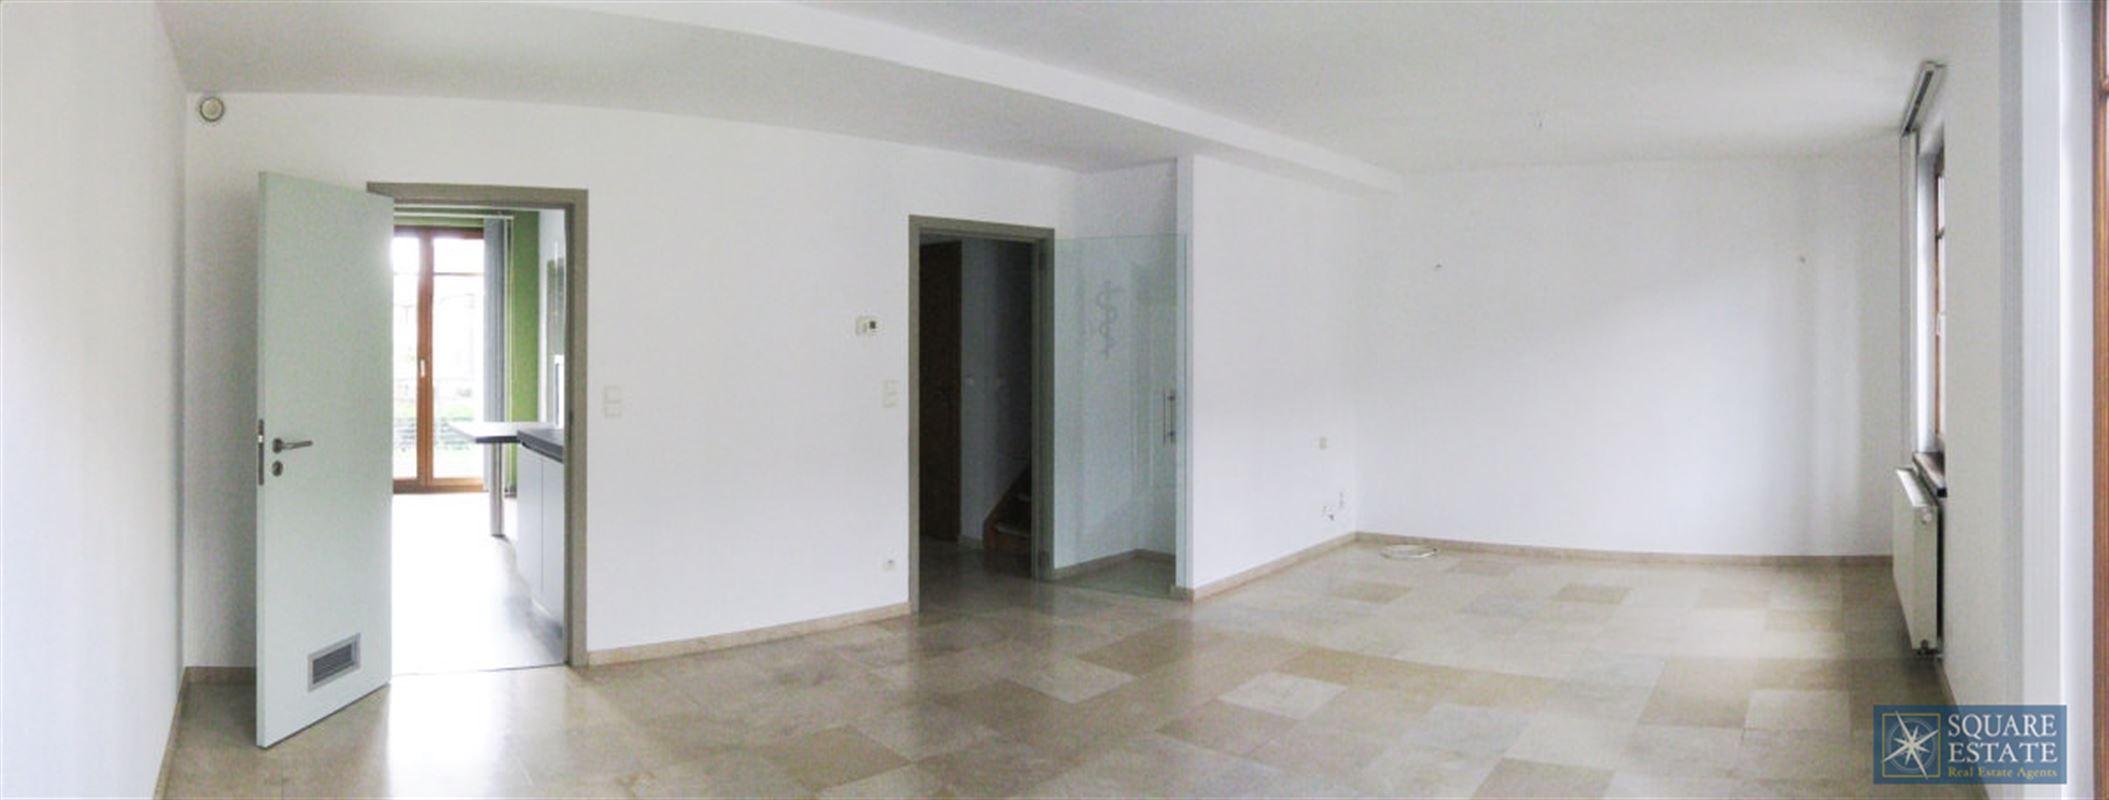 Foto 1 : Duplex/Penthouse te 1780 Wemmel (België) - Prijs € 1.100